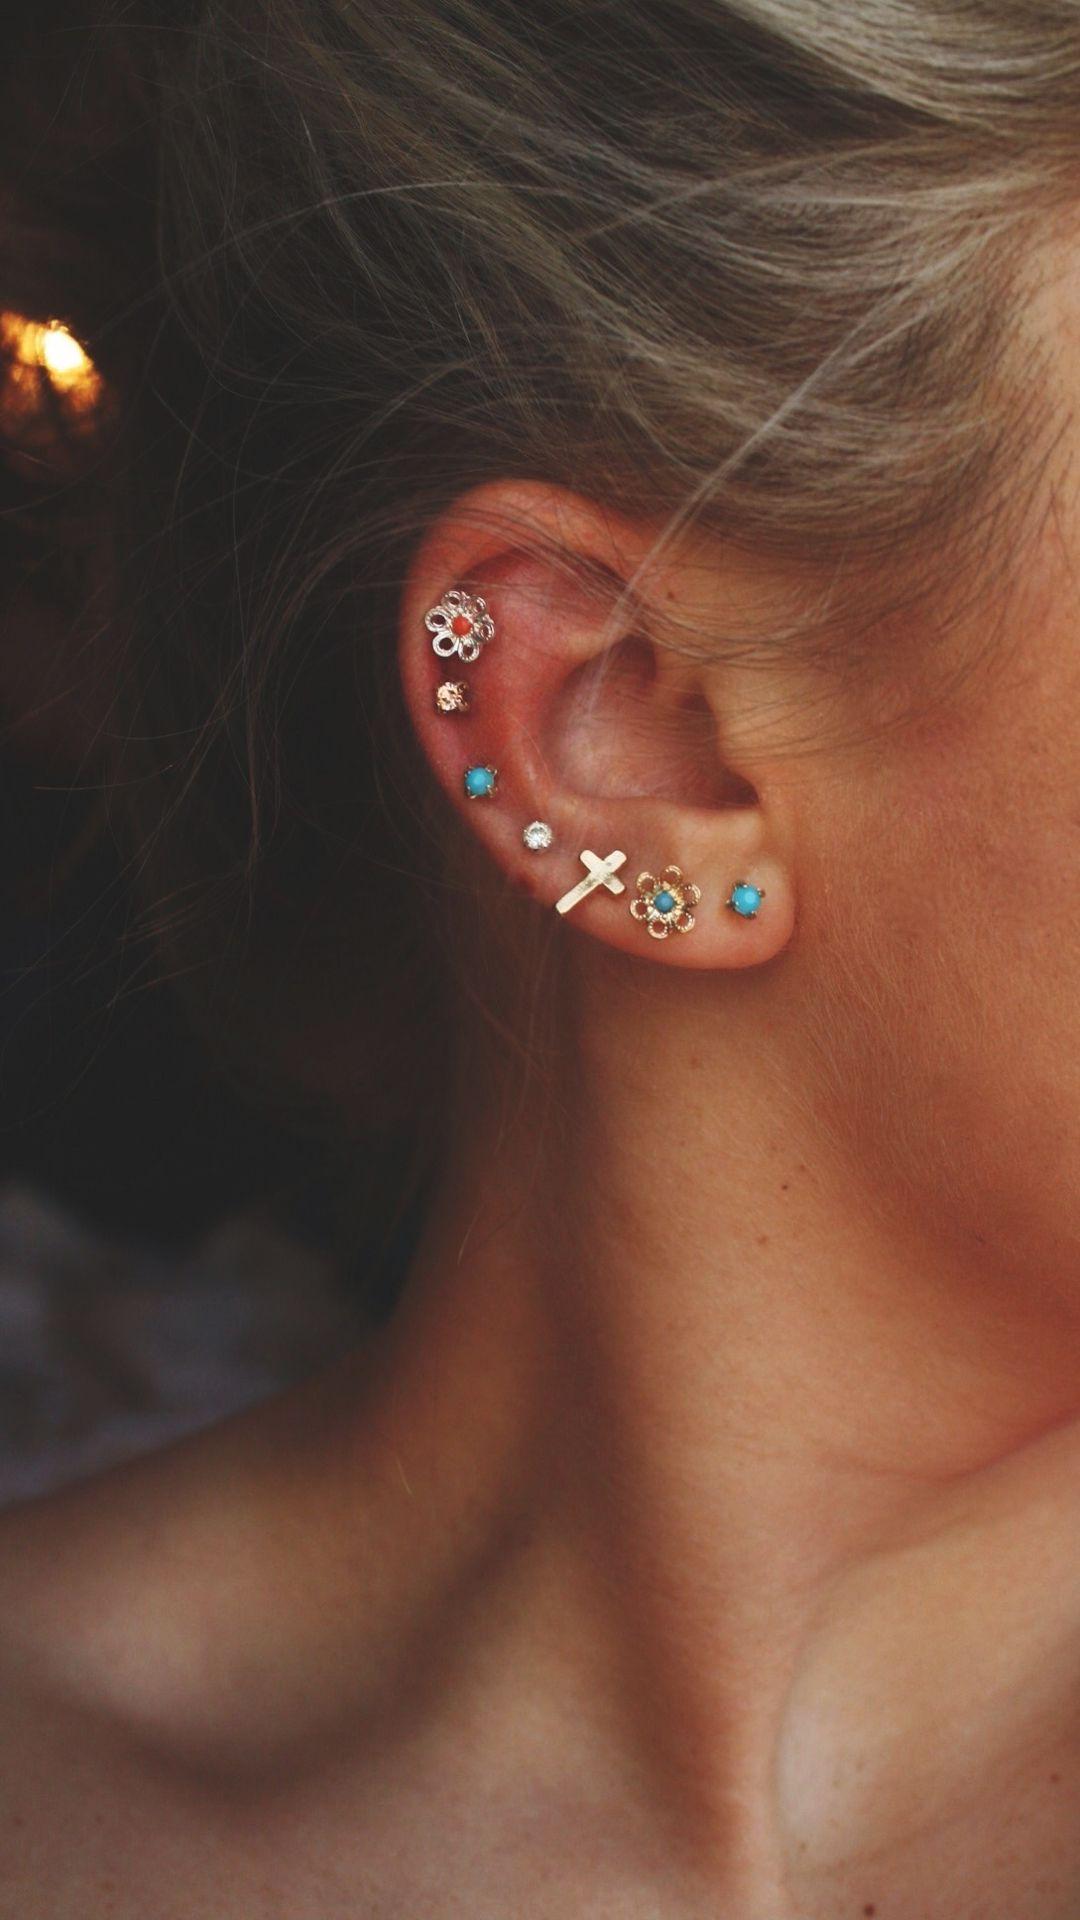 Piercing ideas for girls  Pin by Alysa Casey on Piercingstattoos  Pinterest  Piercings